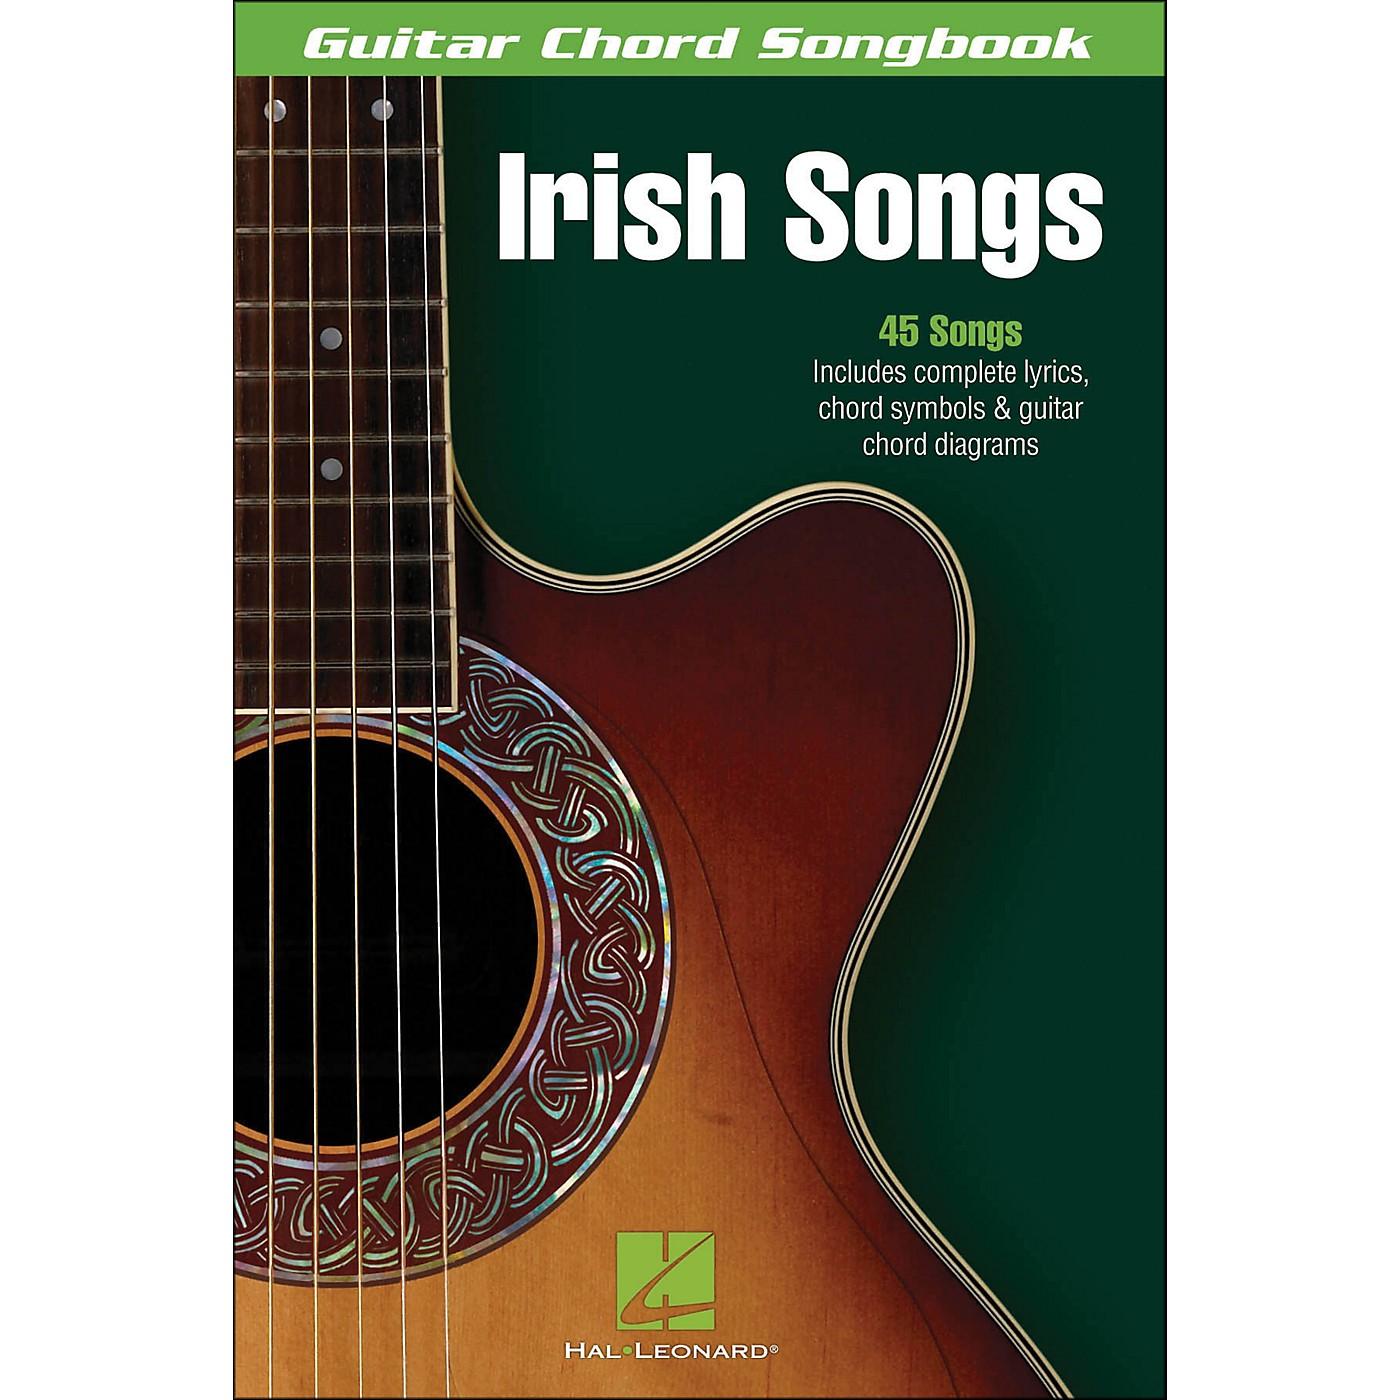 Hal Leonard Irish Songs Guitar Chord Songbook thumbnail